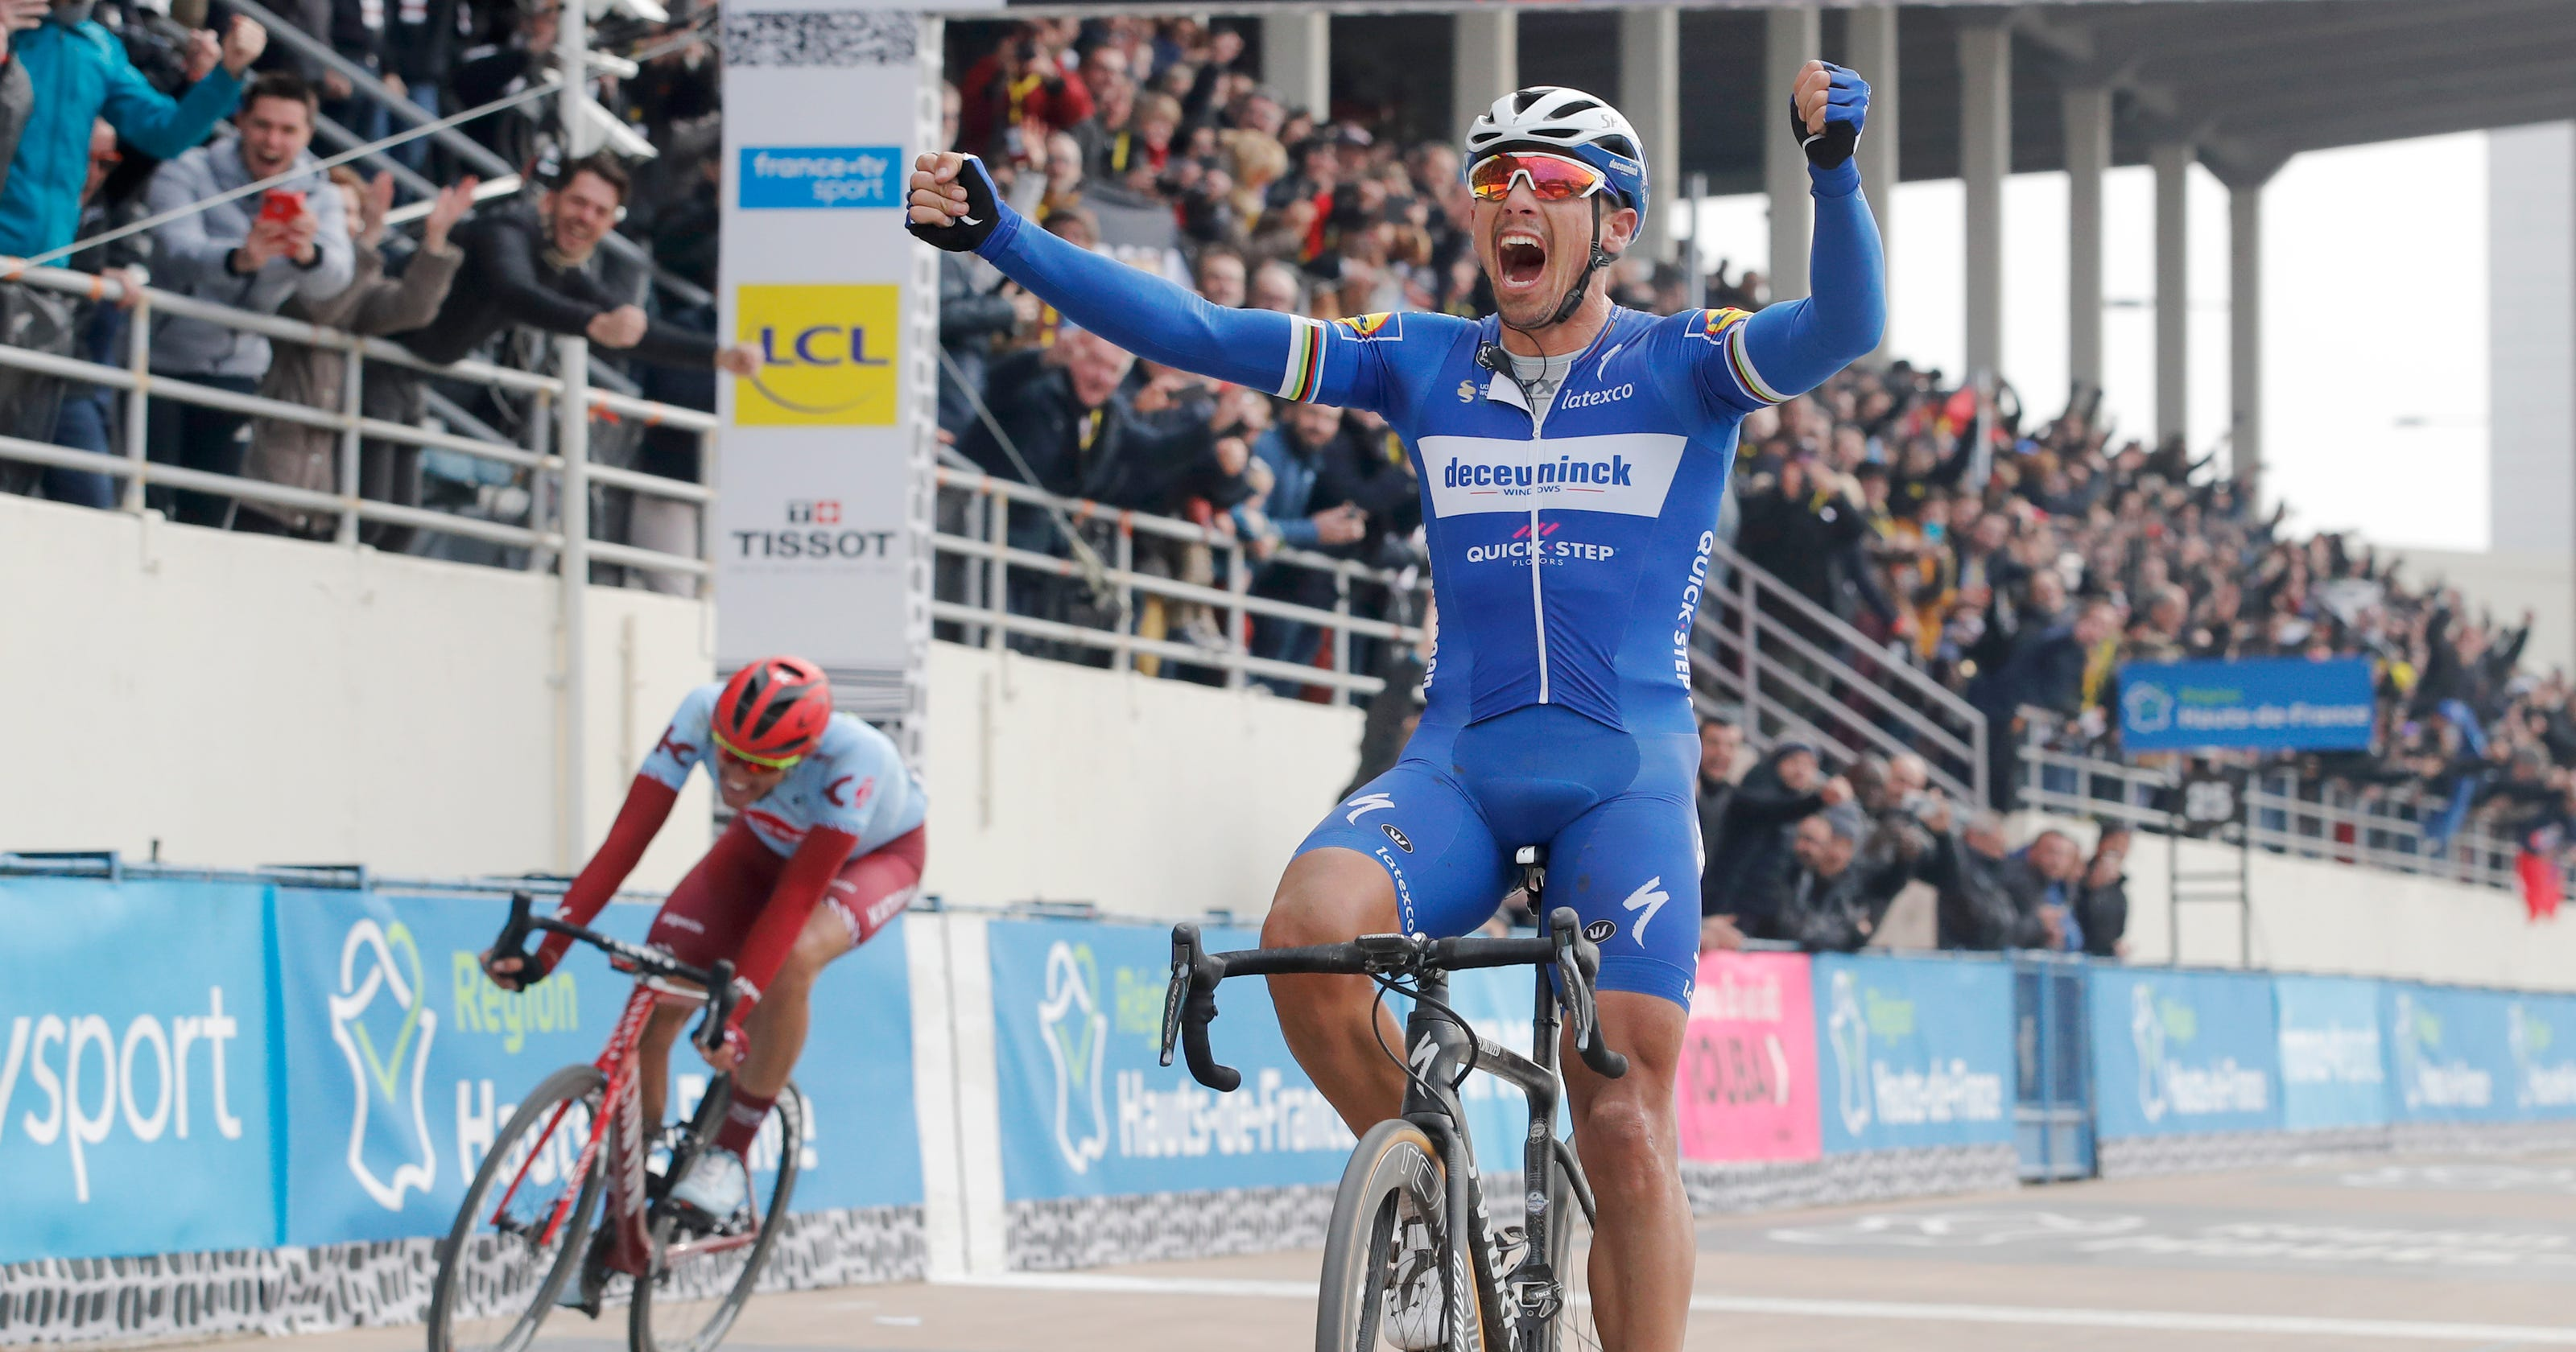 Belgian veteran Gilbert beats Politt to win Paris-Roubaix